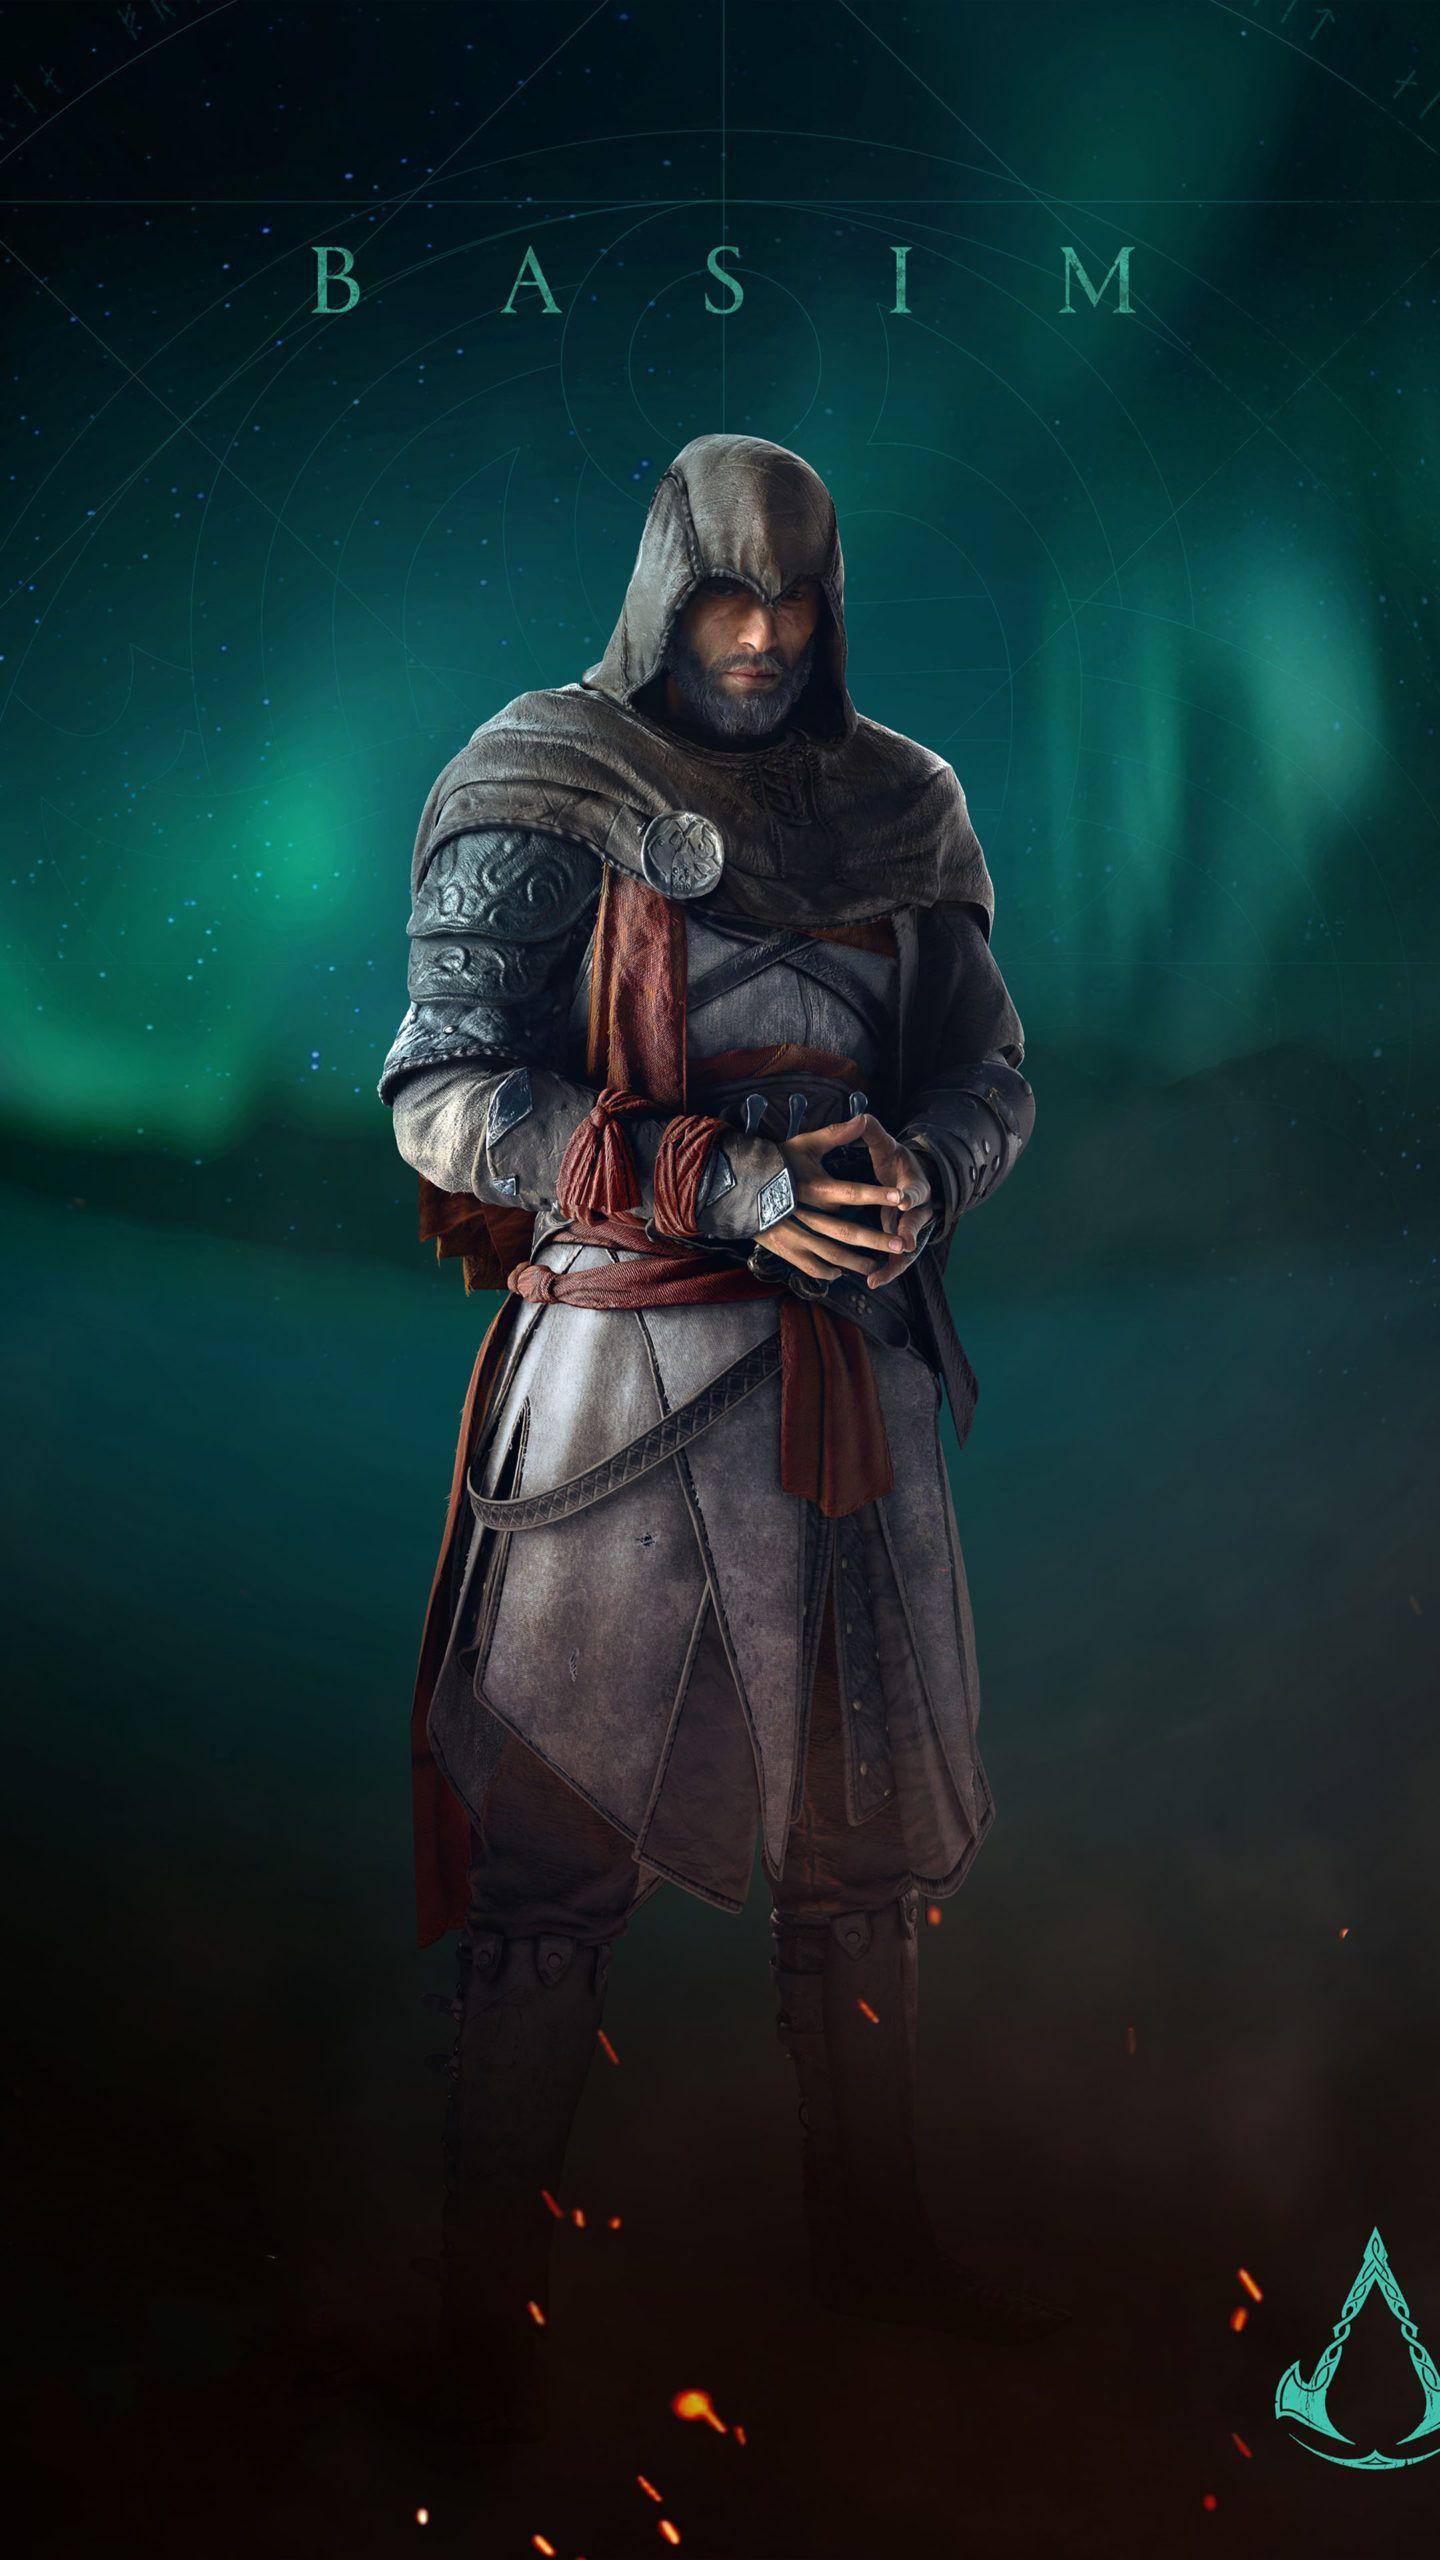 Basim Assassin S Creed Valhalla 4k Ultra Hd Mobile Wallpaper Assassin S Creed Assassins Creed Assassins Creed Artwork